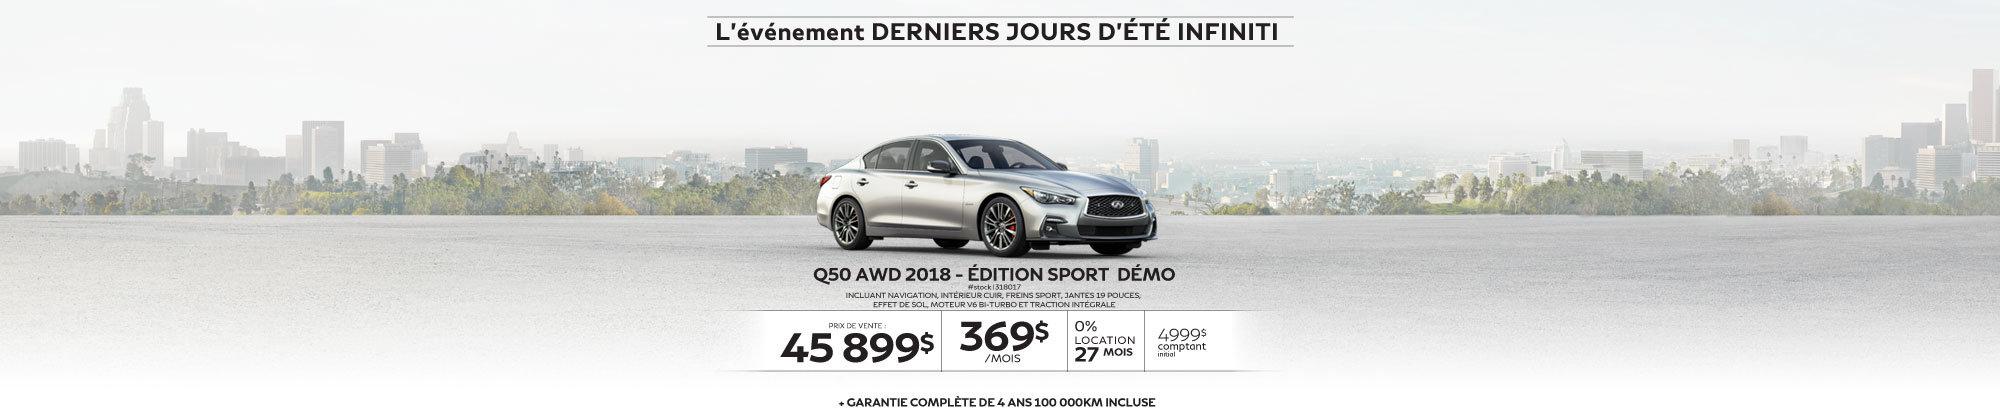 Q50 AWD 2018 – Édition SPORT Démo web